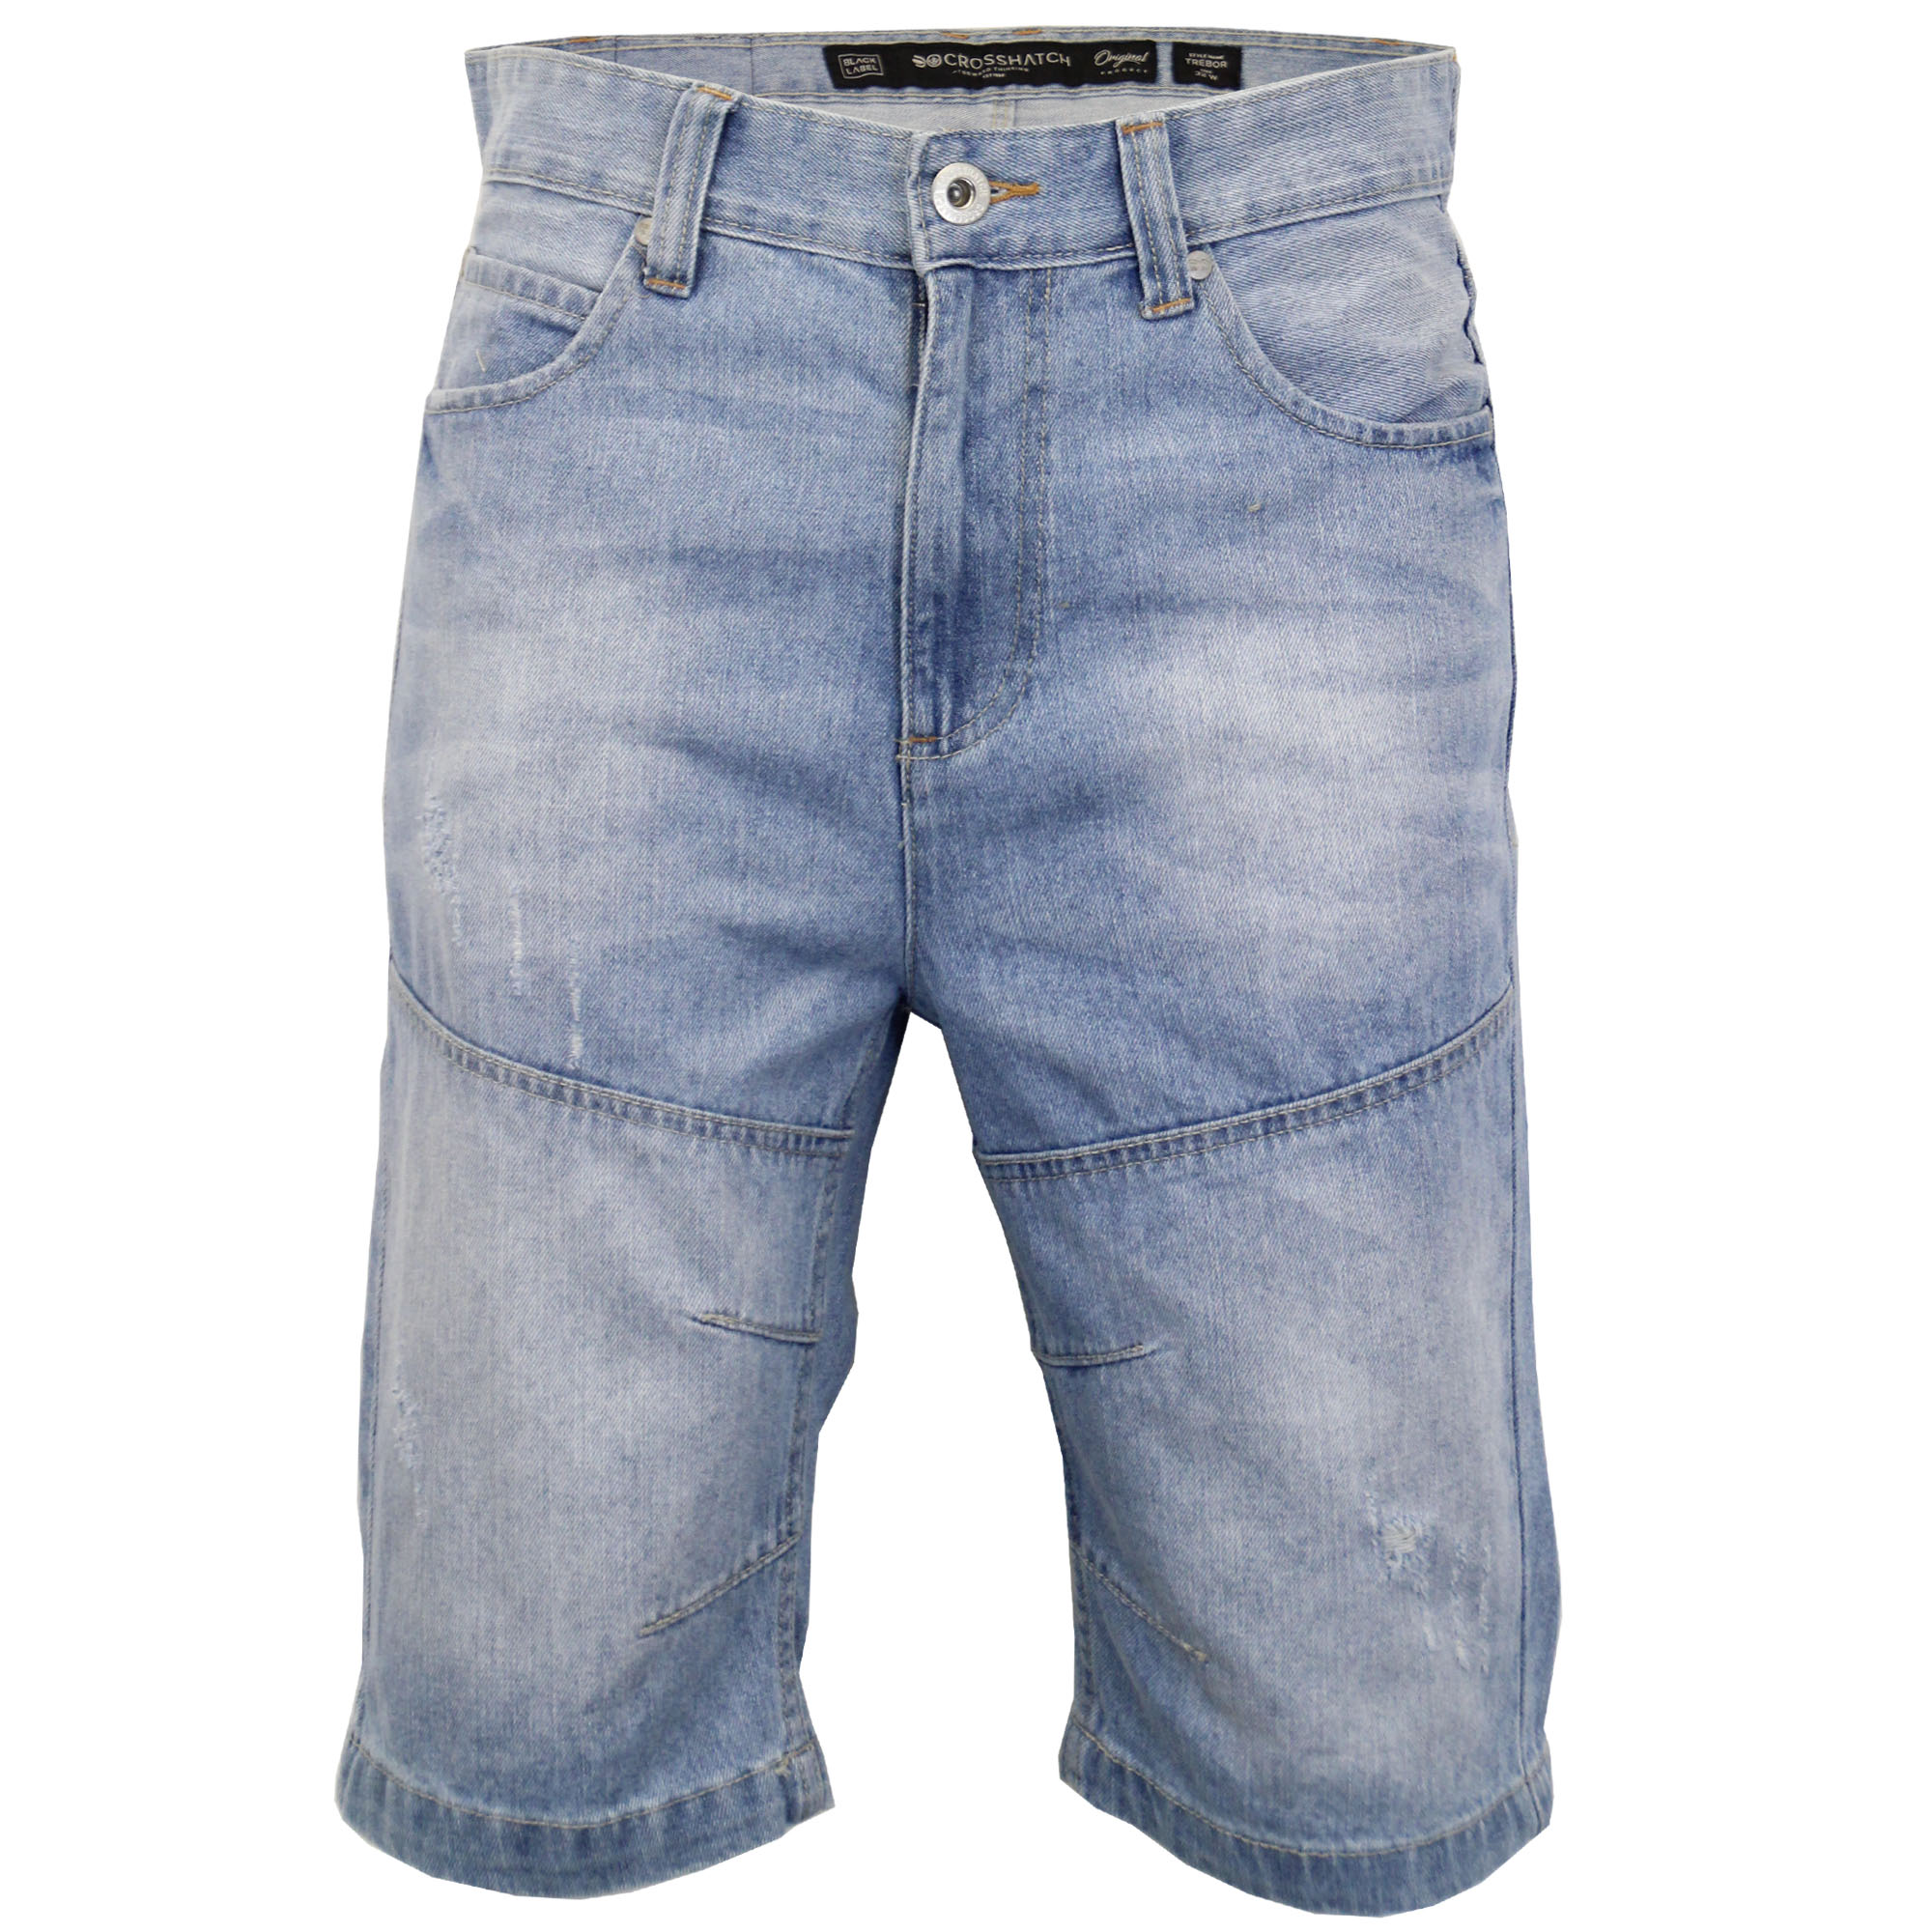 Mens-Crosshatch-Denim-Knee-Length-Combat-Shorts-Cargo-Casual-Fashion-Summer-New 縮圖 42